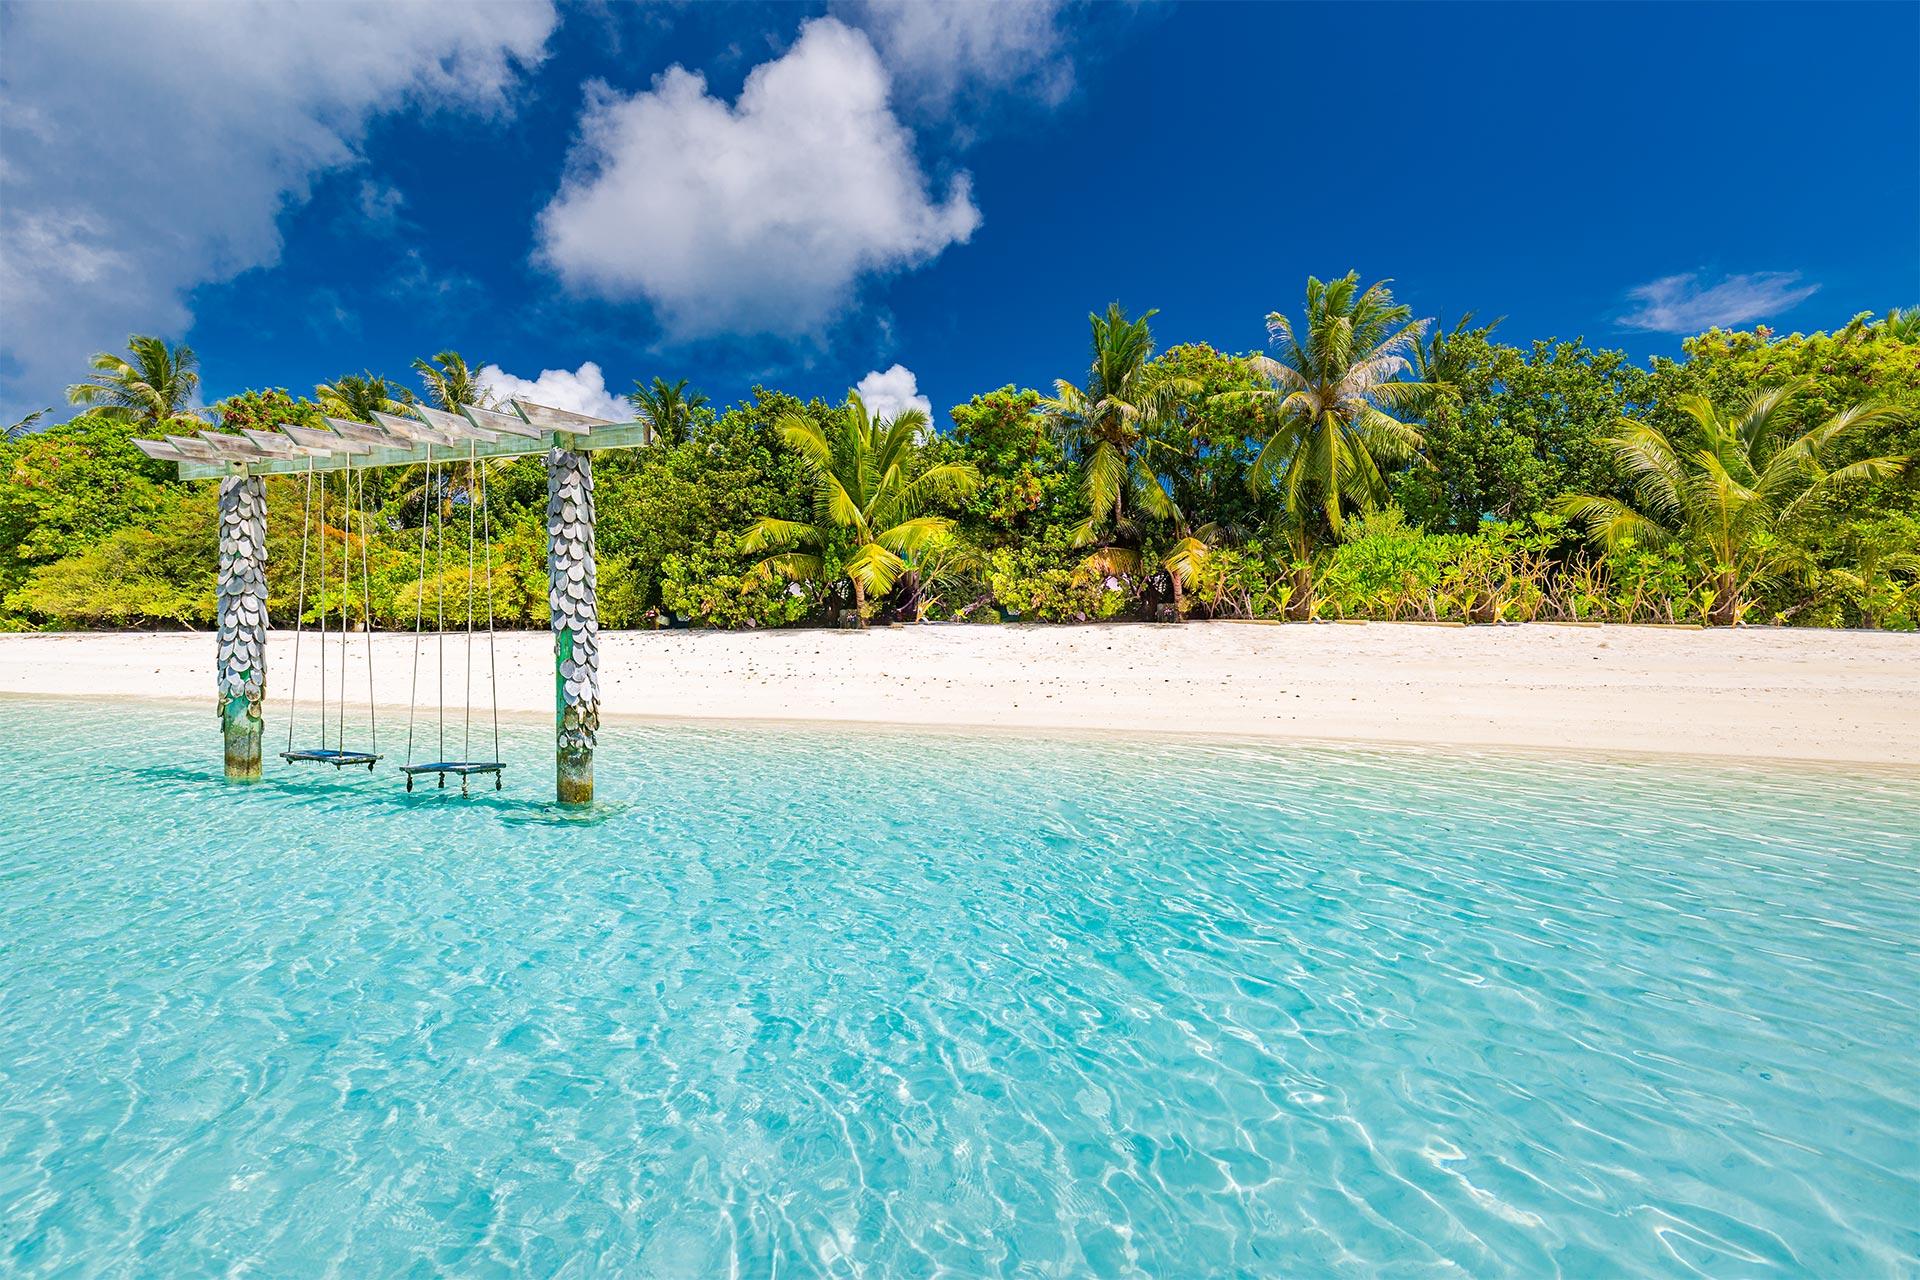 Sejur plaja Maldive, 10 zile - decembrie 2021